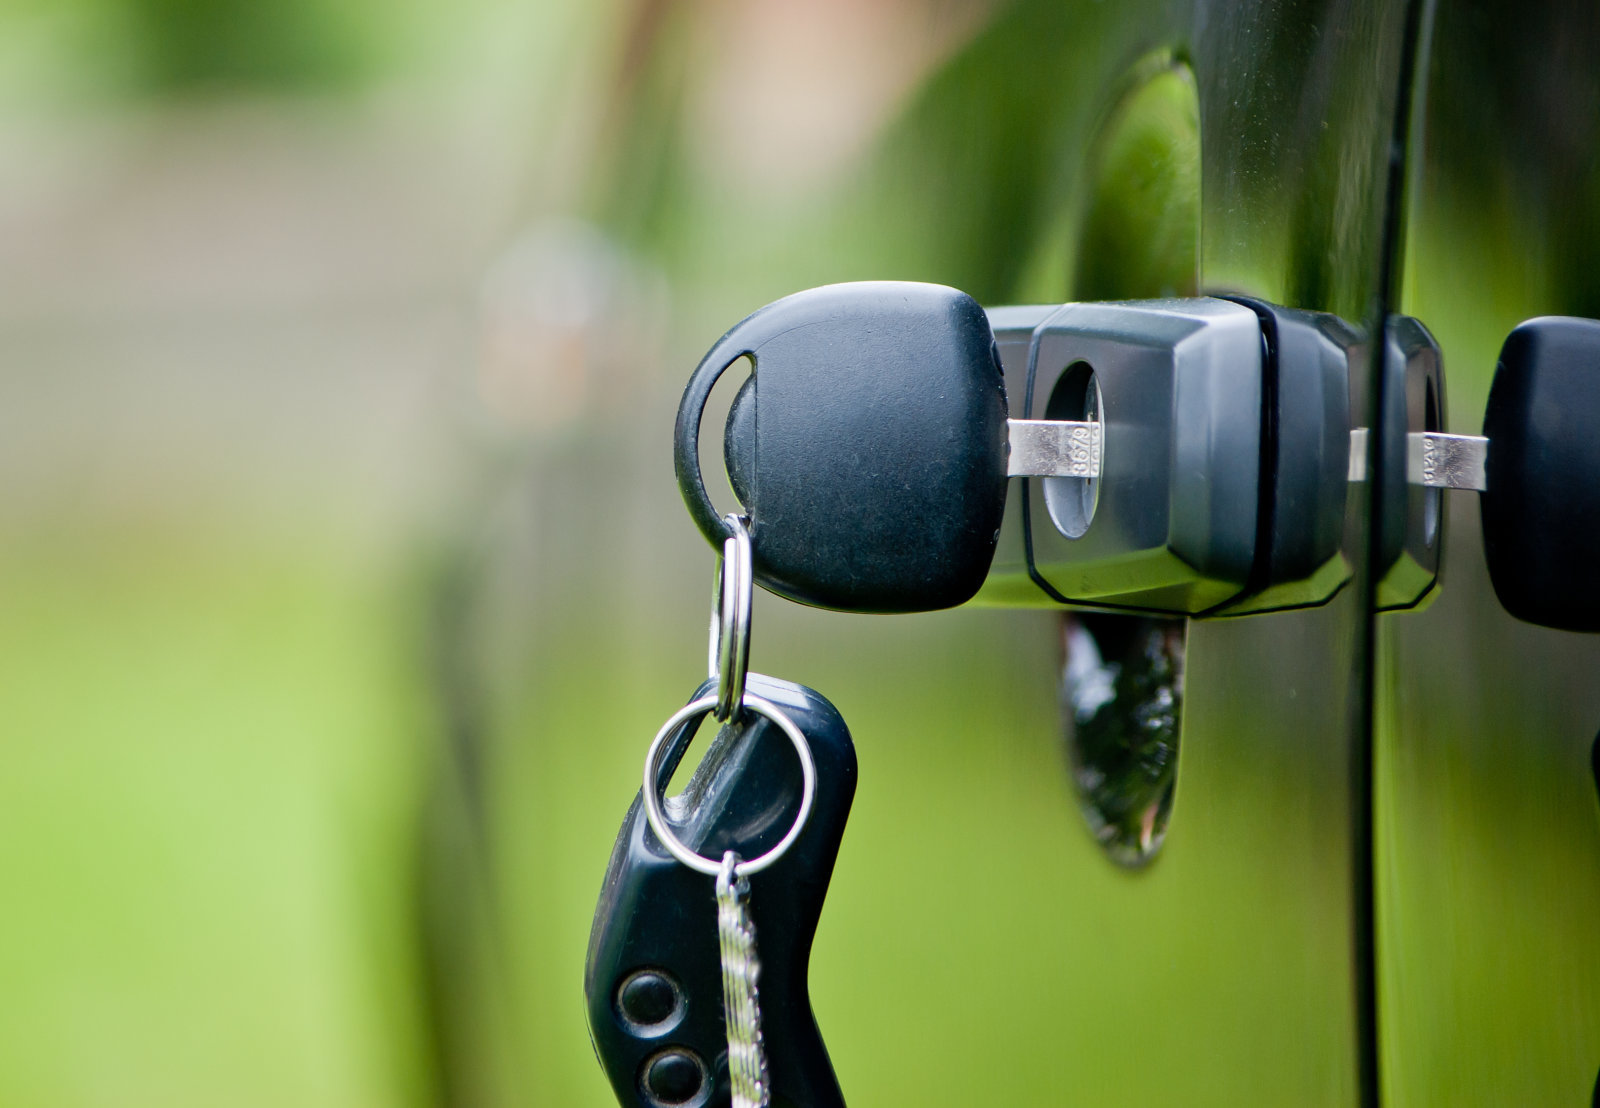 chiave auto